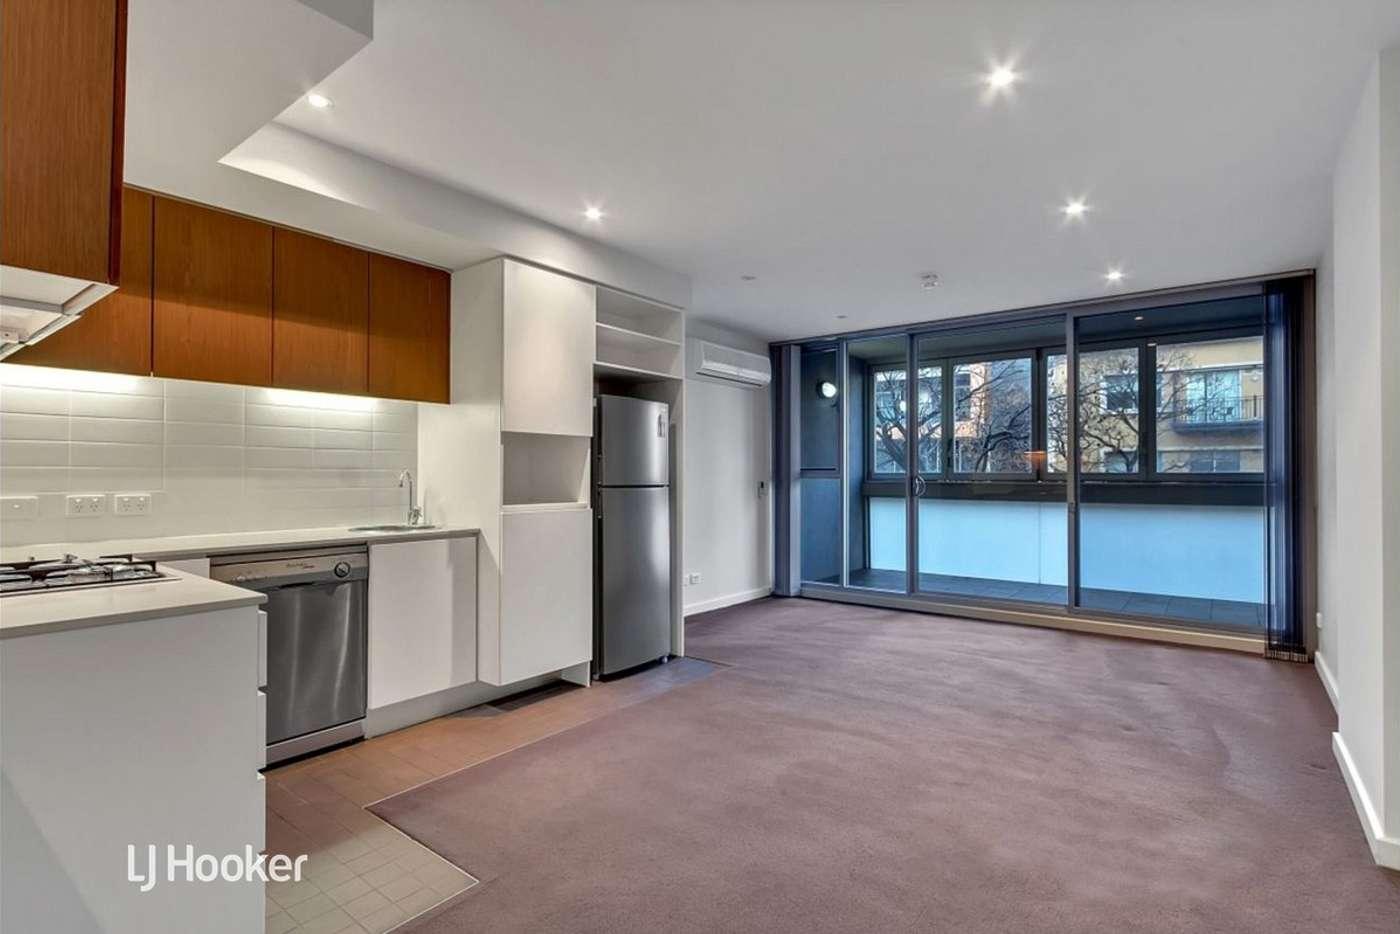 Sixth view of Homely apartment listing, 105/191 Morphett Street, Adelaide SA 5000